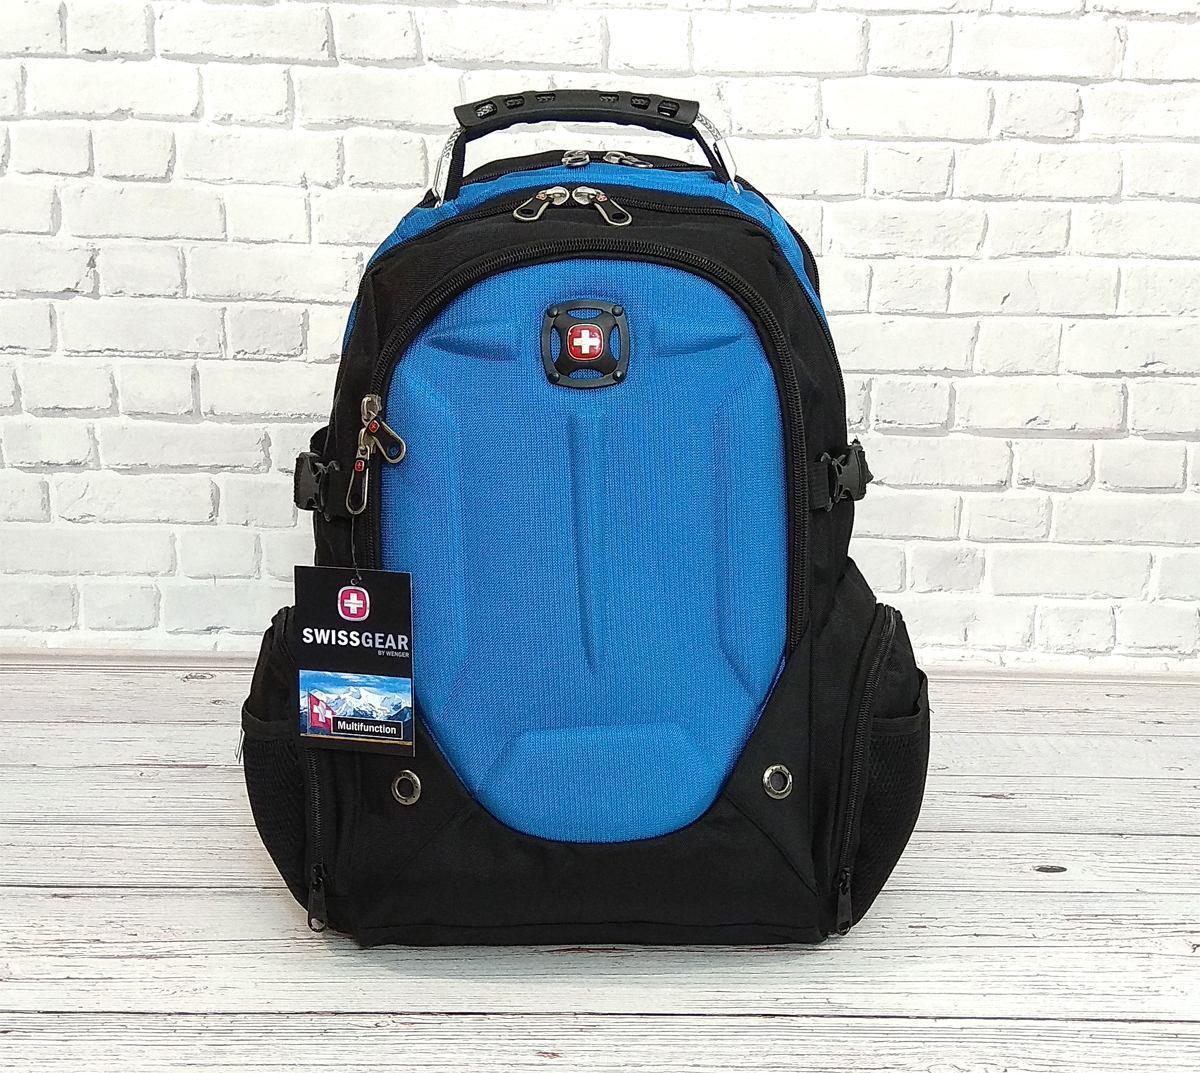 Рюкзак в стиле SwissGear Wenger черный с синим